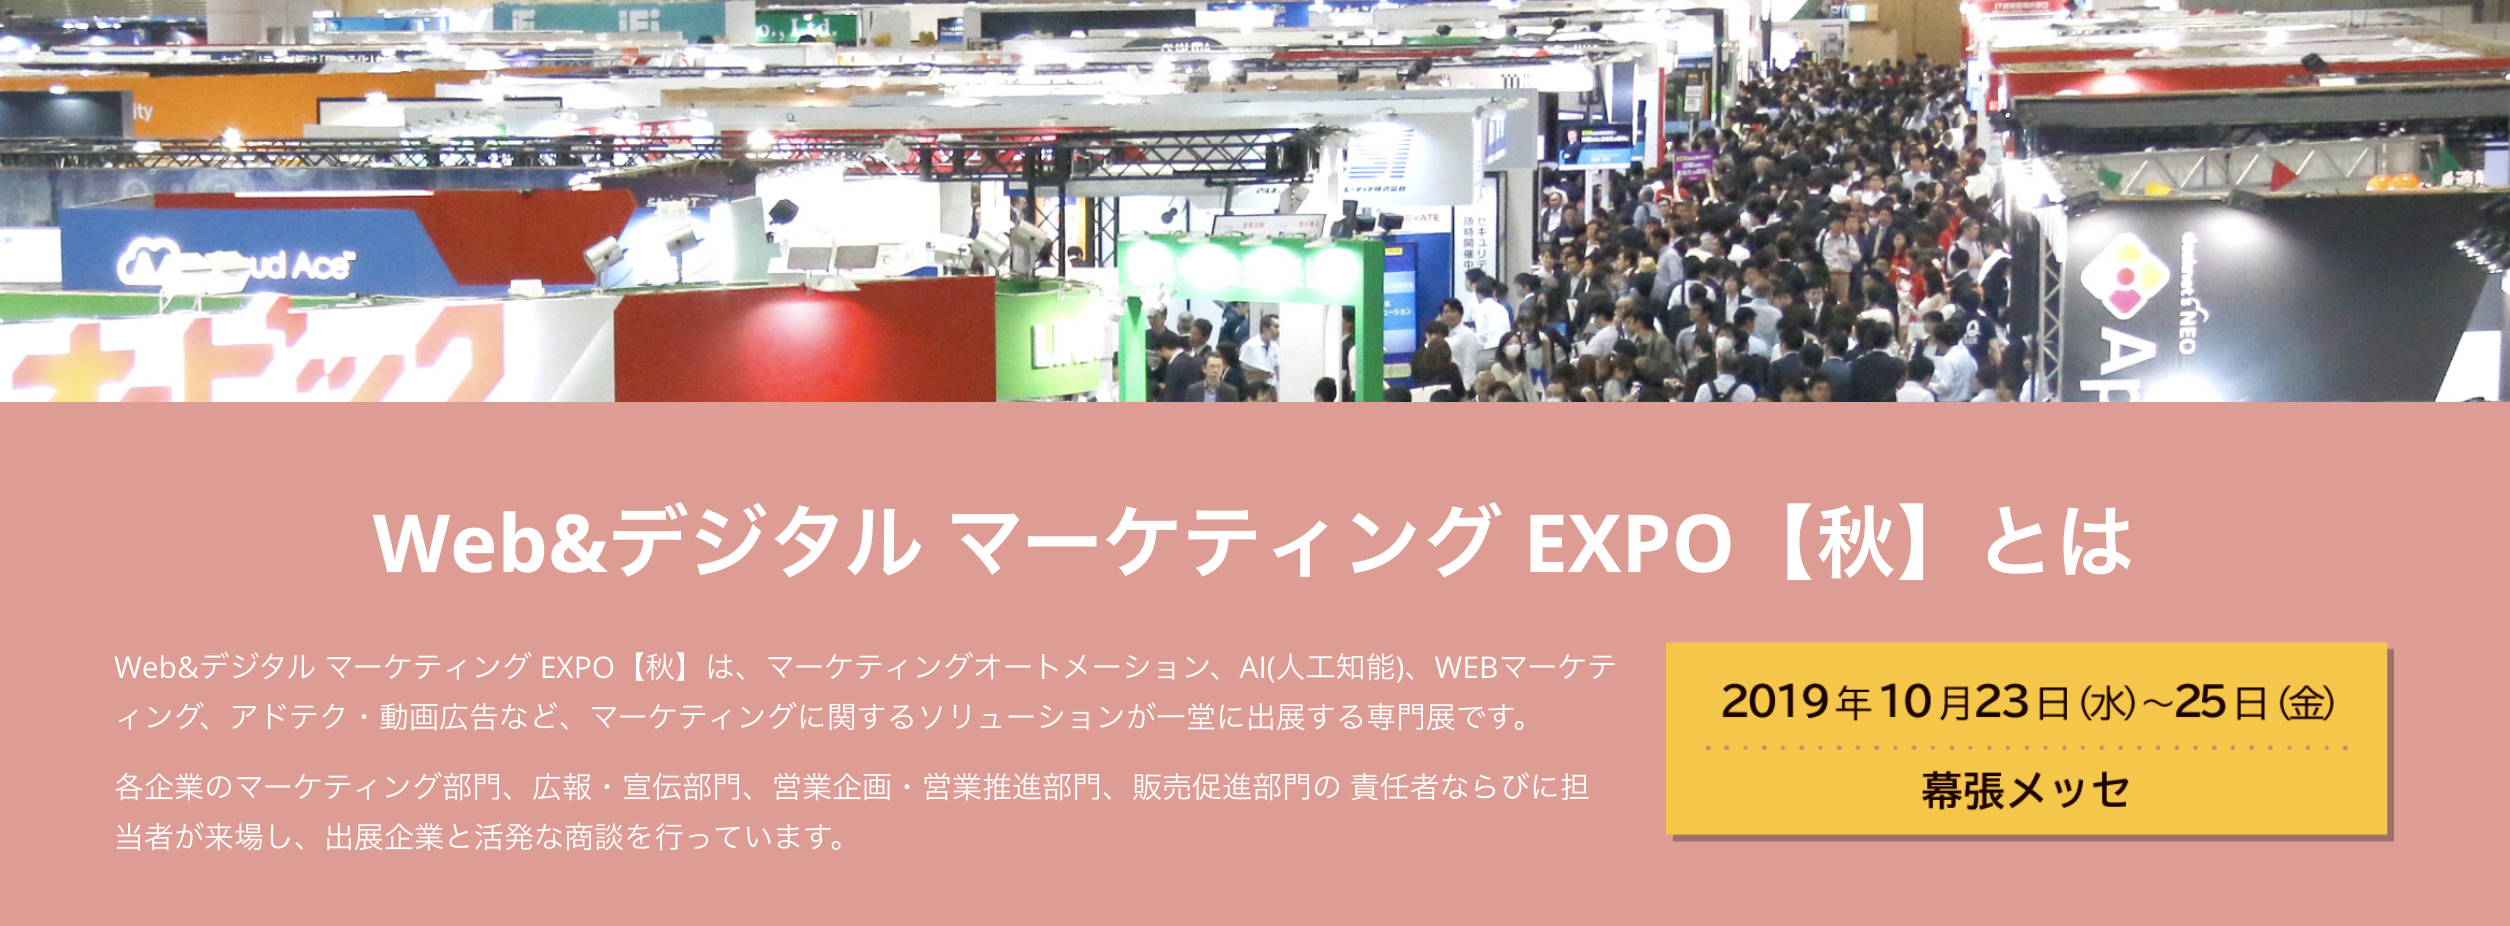 JapanITWeek 【秋】(展示会)に出展します